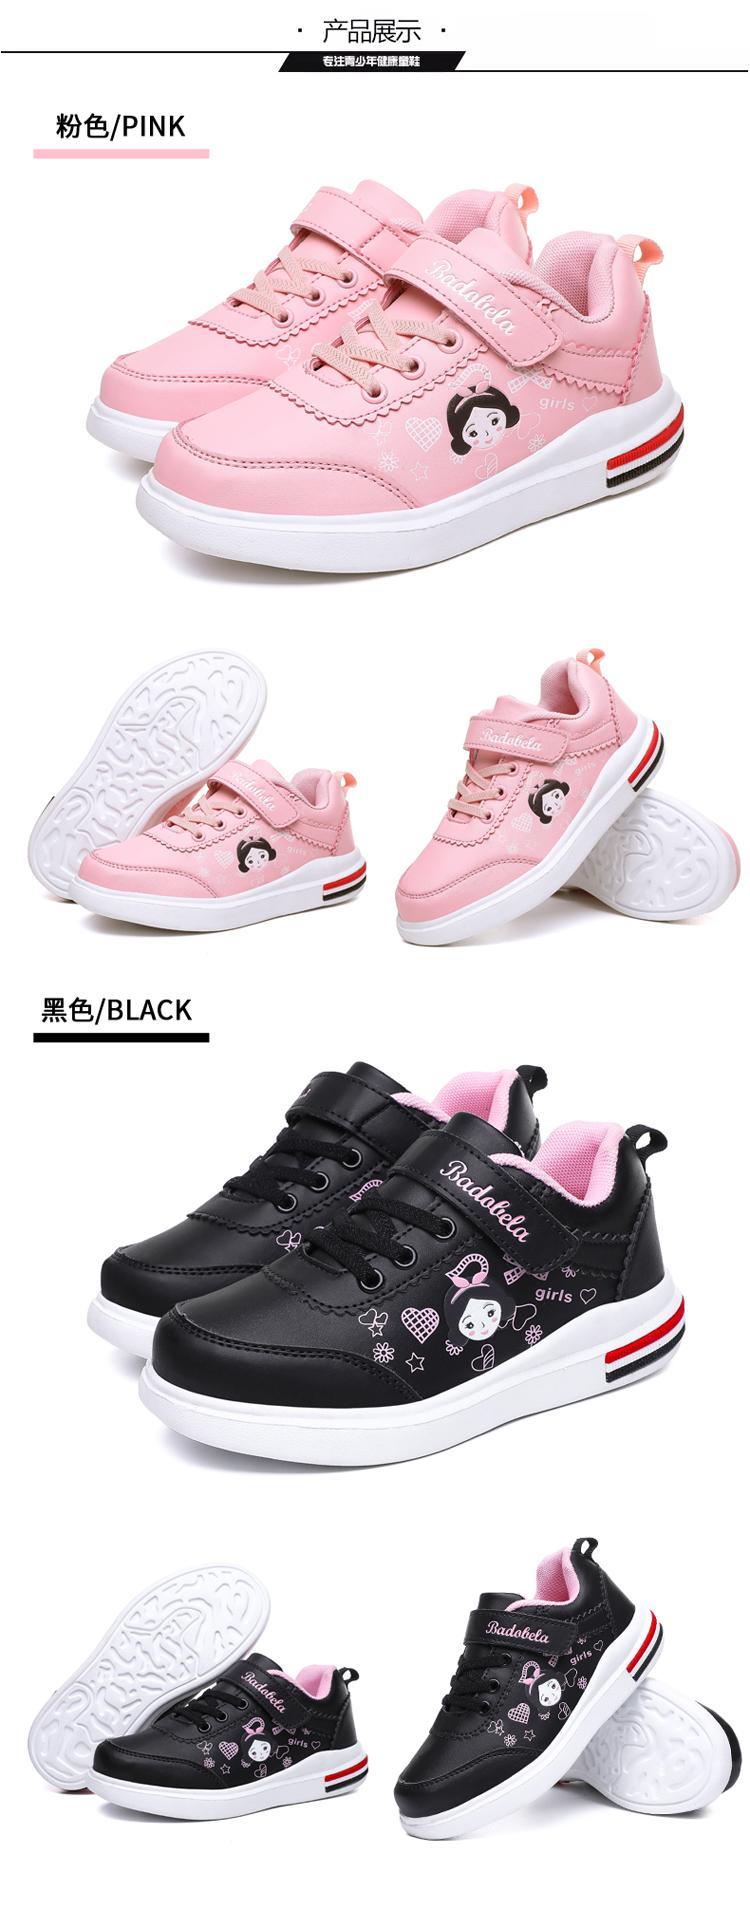 Sepatu Anak Perempuan Sepatu Sneakers Sepatu Anak Sd Sepatu Anak